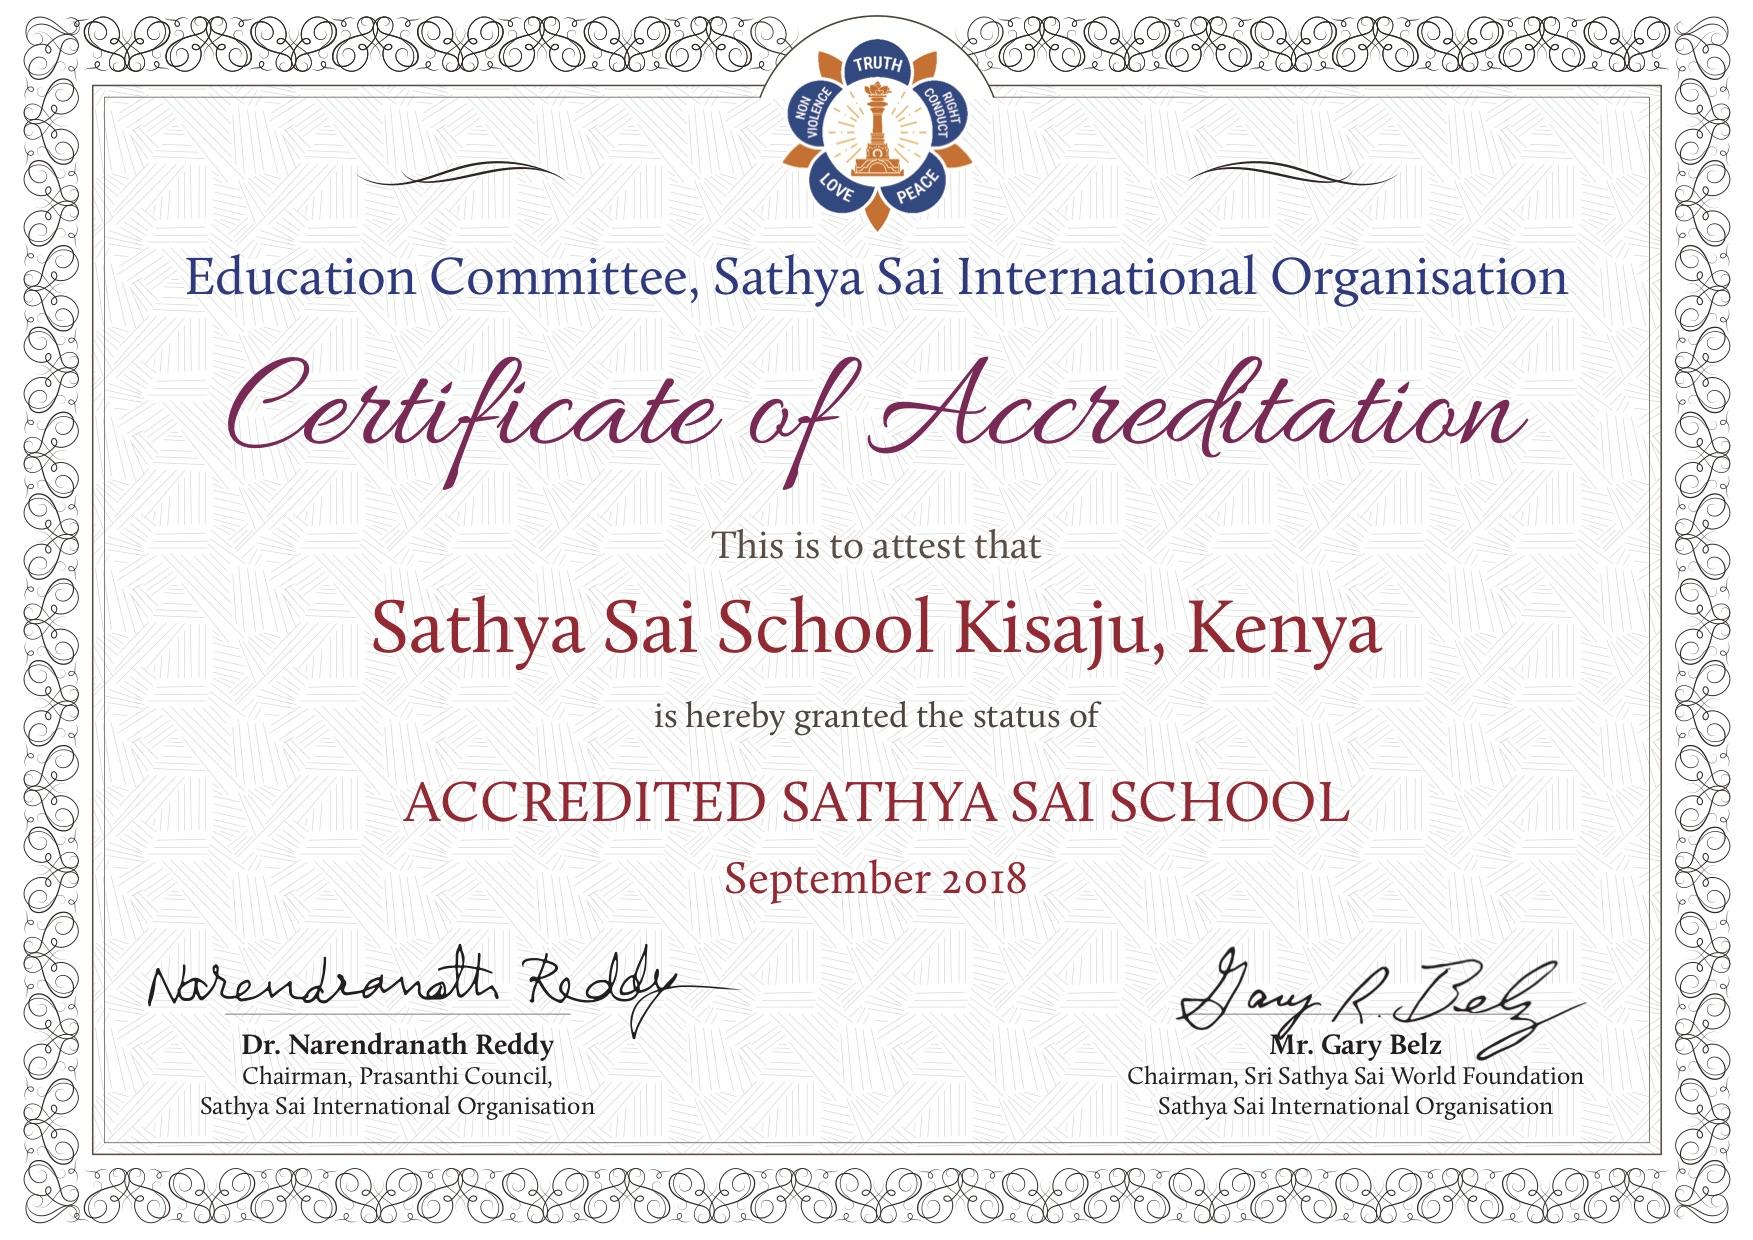 Accreditation Certificate - Sathya Sai School Kisaju Kenya